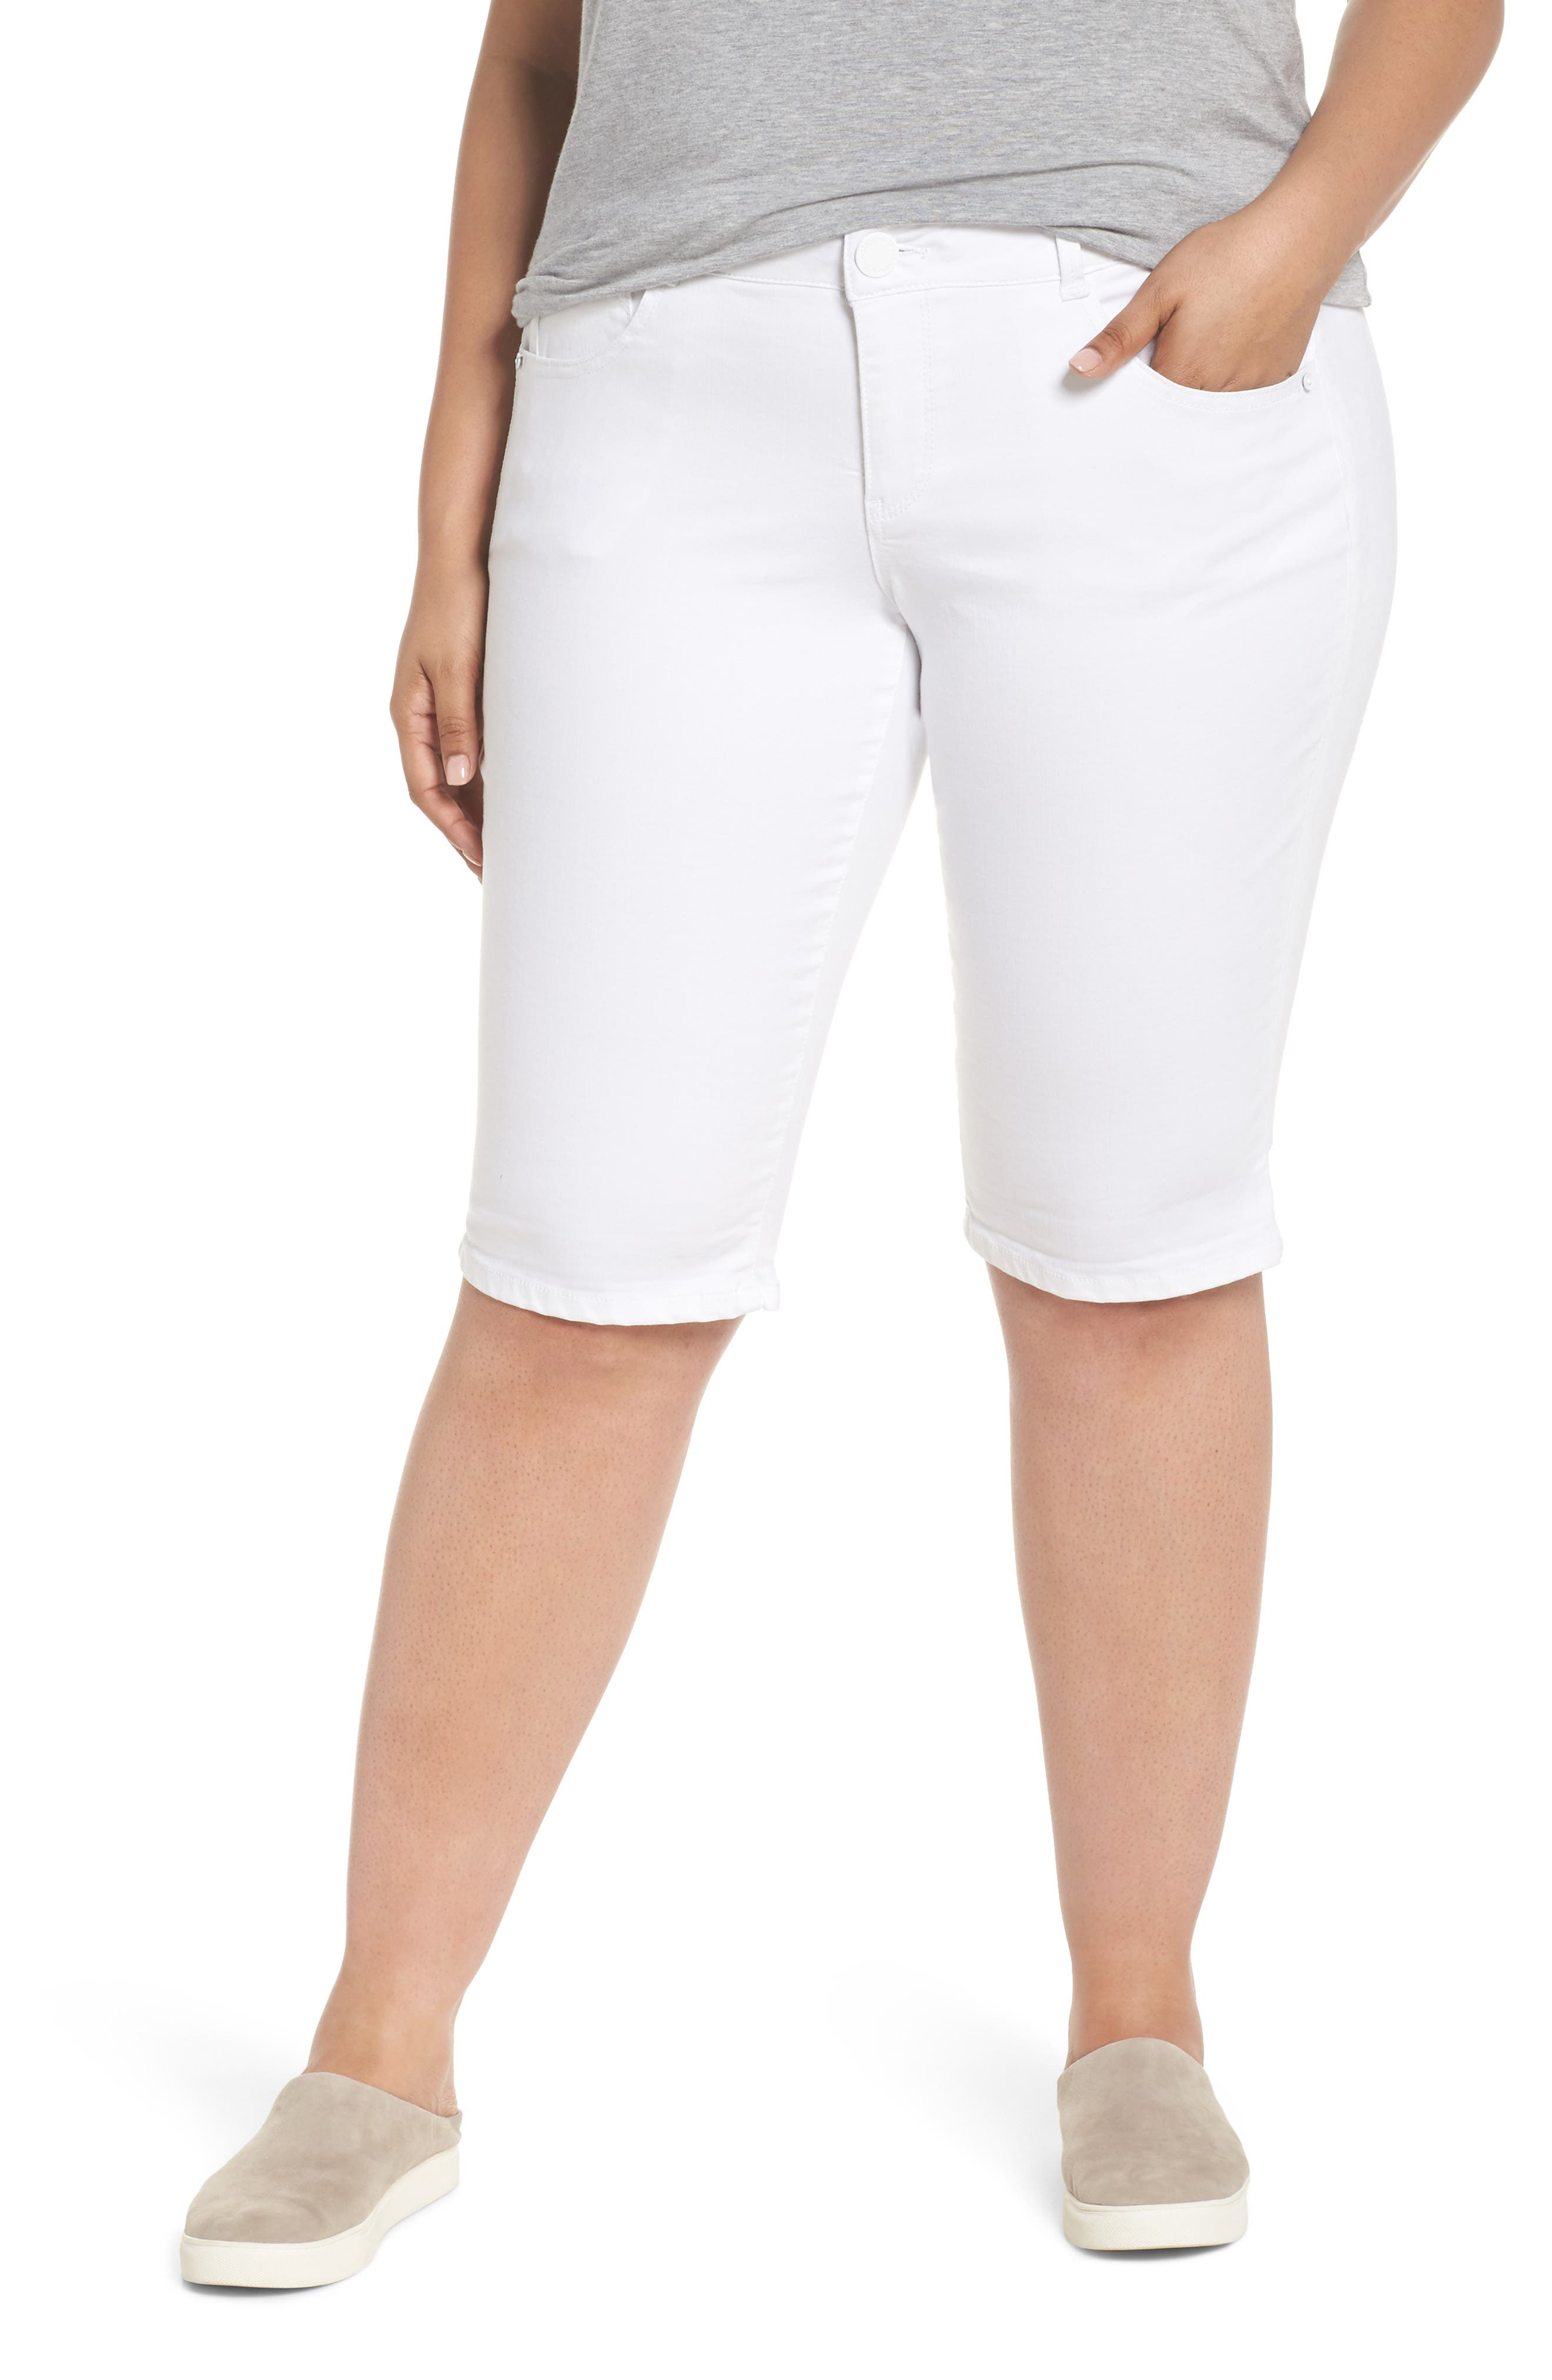 Ab-solution Bermuda Shorts,                             Main thumbnail 1, color,                             Optic White